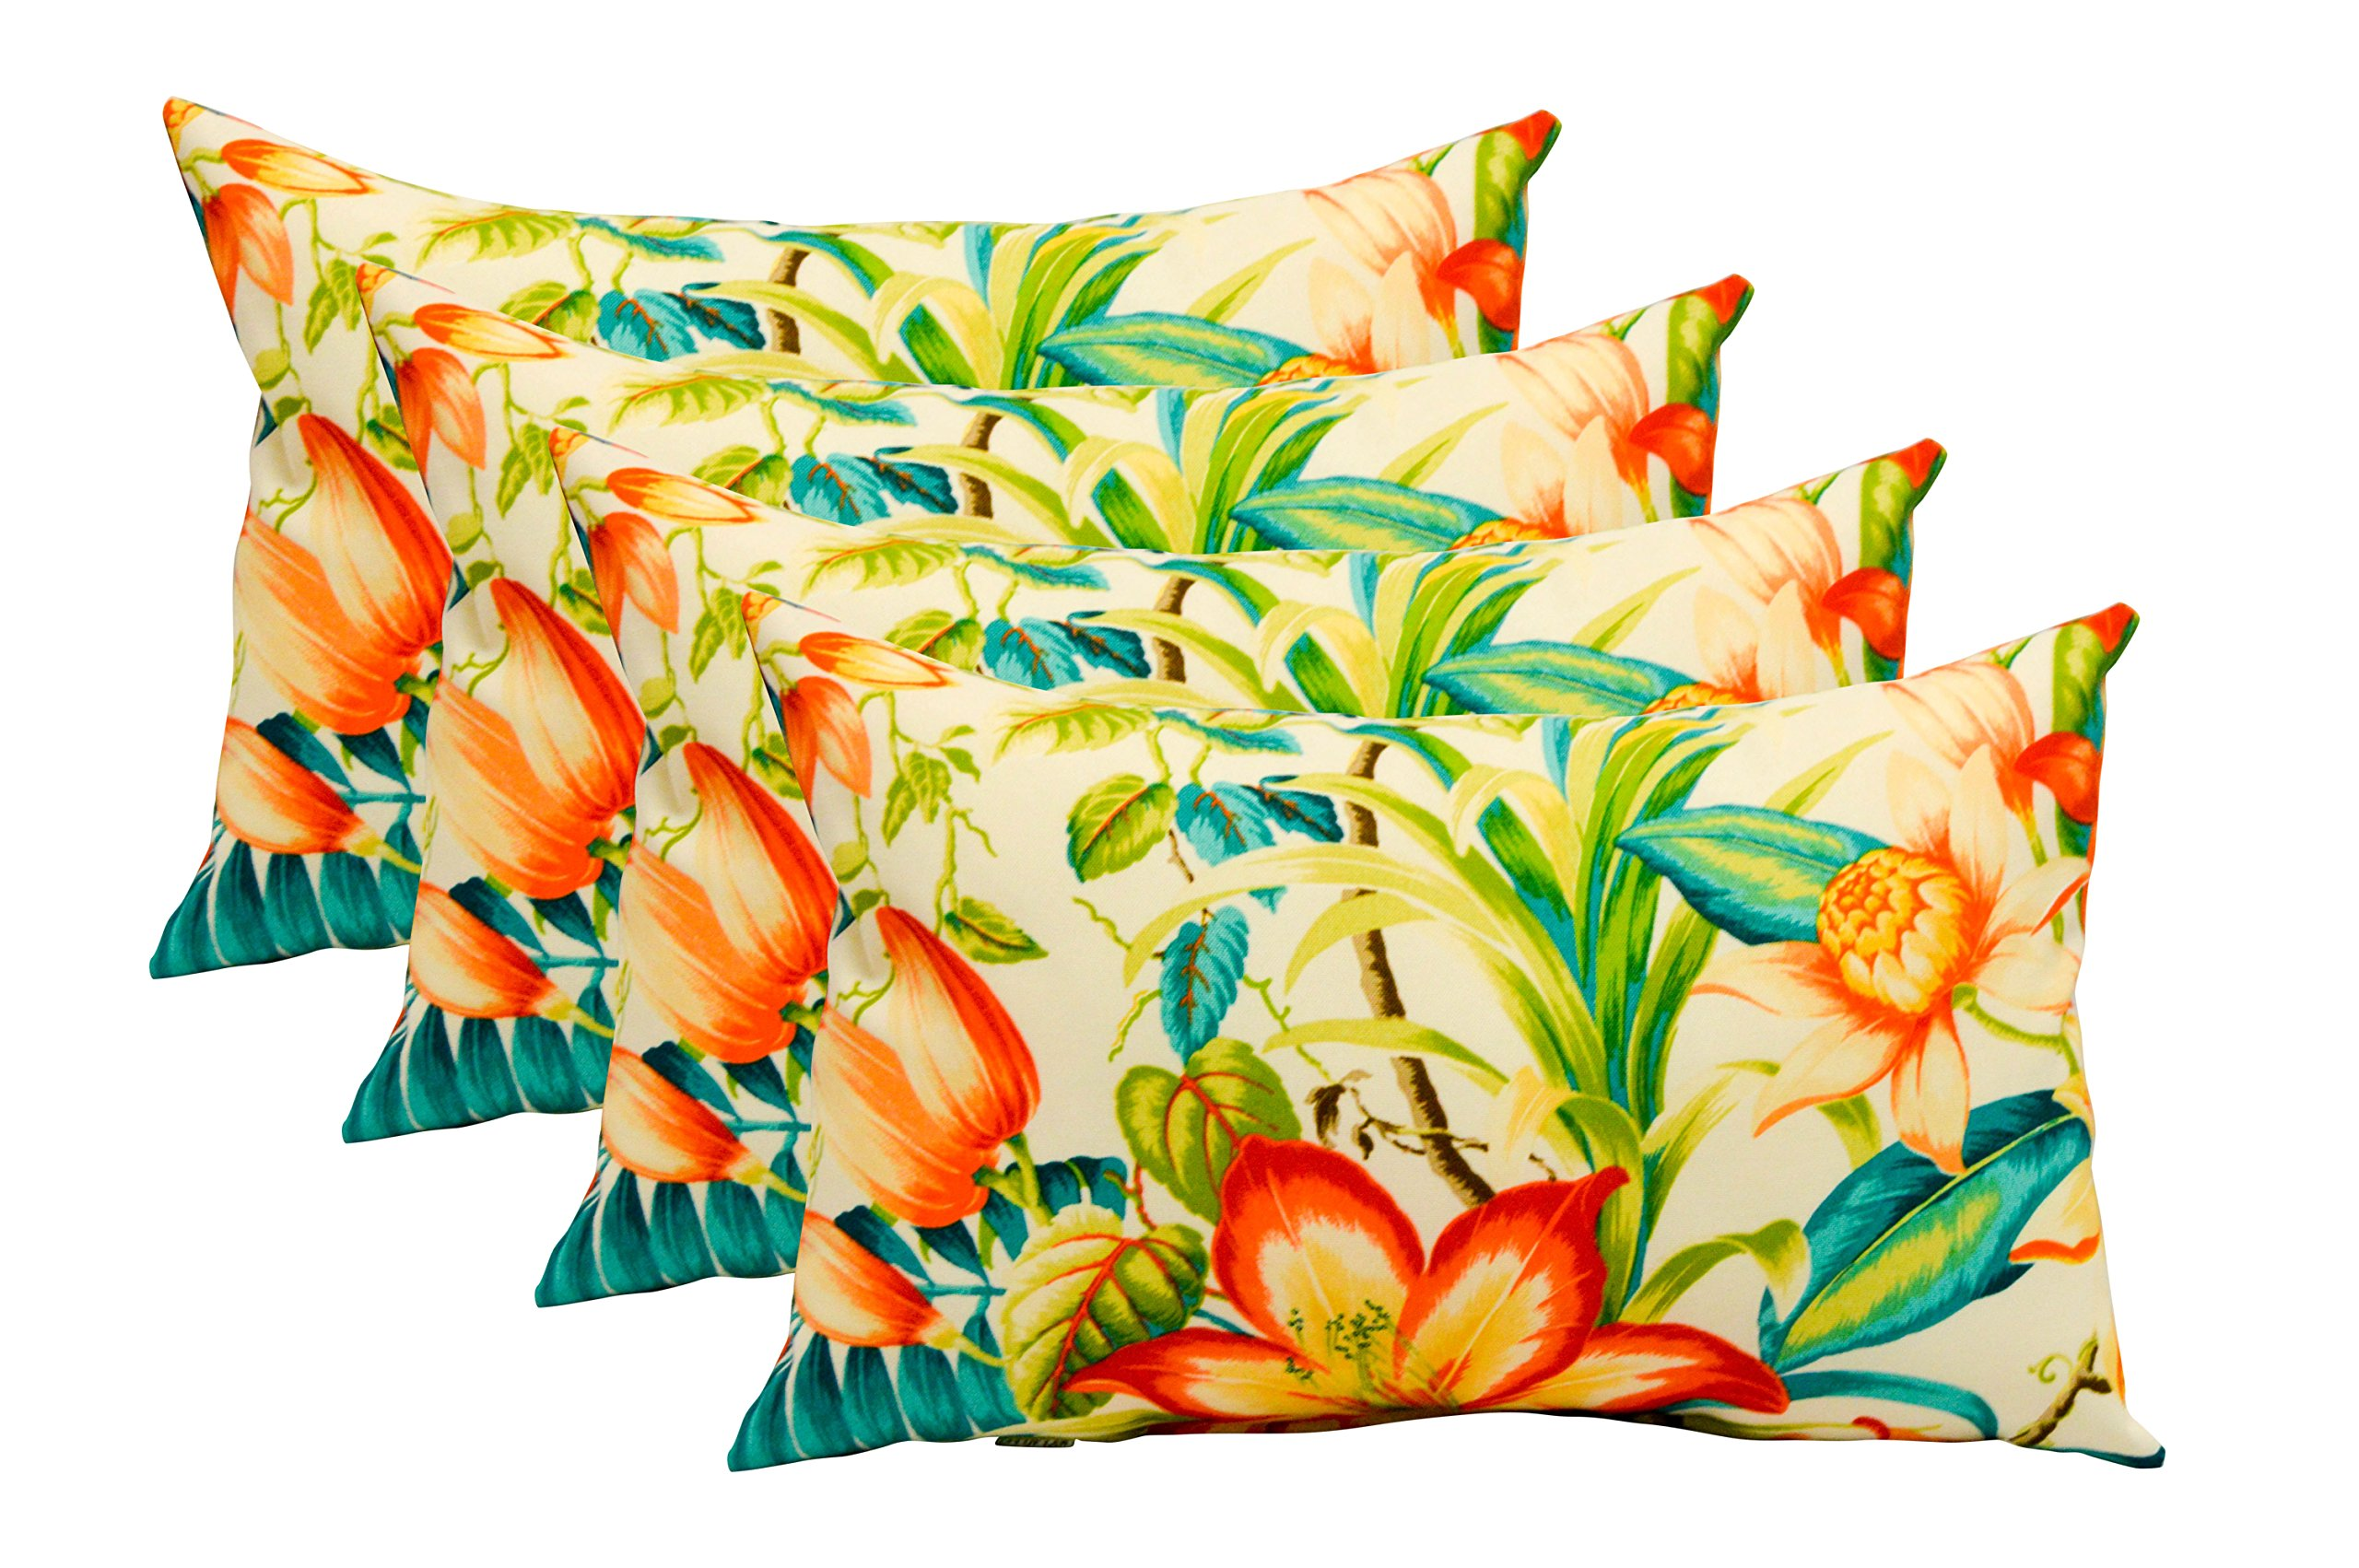 Set of 4 Indoor / Outdoor Decorative Lumbar / Rectangle Pillows - Made with Tommy Bahama Original Home Fabric - Botanical Glow Tiger Lily Orange Teal Tropical Floral